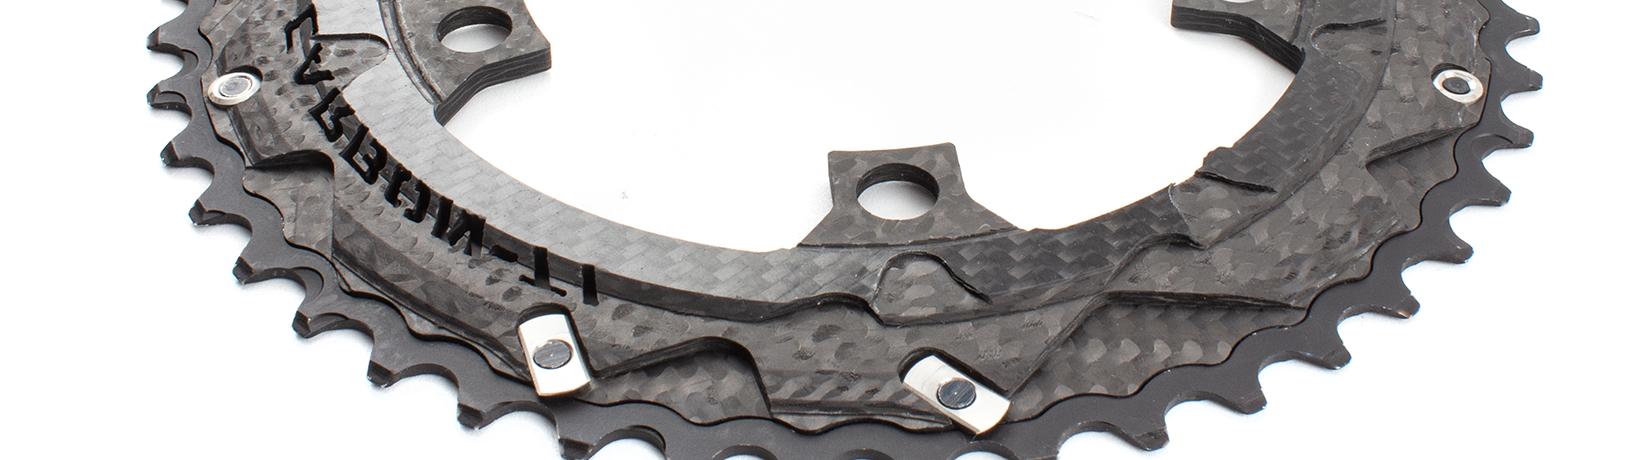 carbon-ti-bicycle-stuff-x-carboring-axs